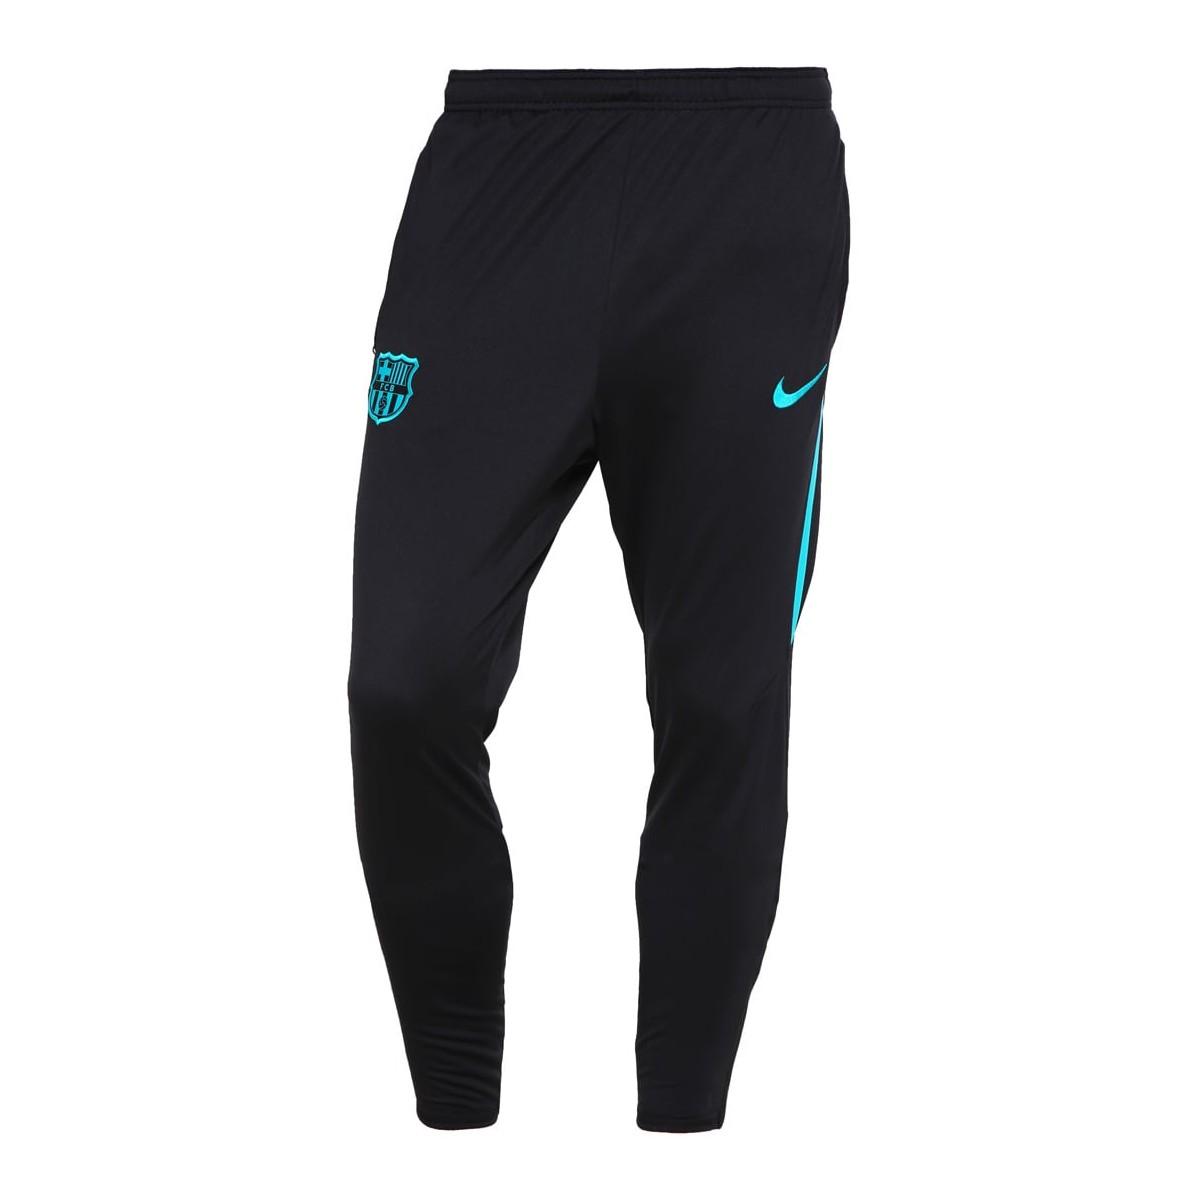 Pantalon De Survêtement Nike Fc Barcelone 808950 014